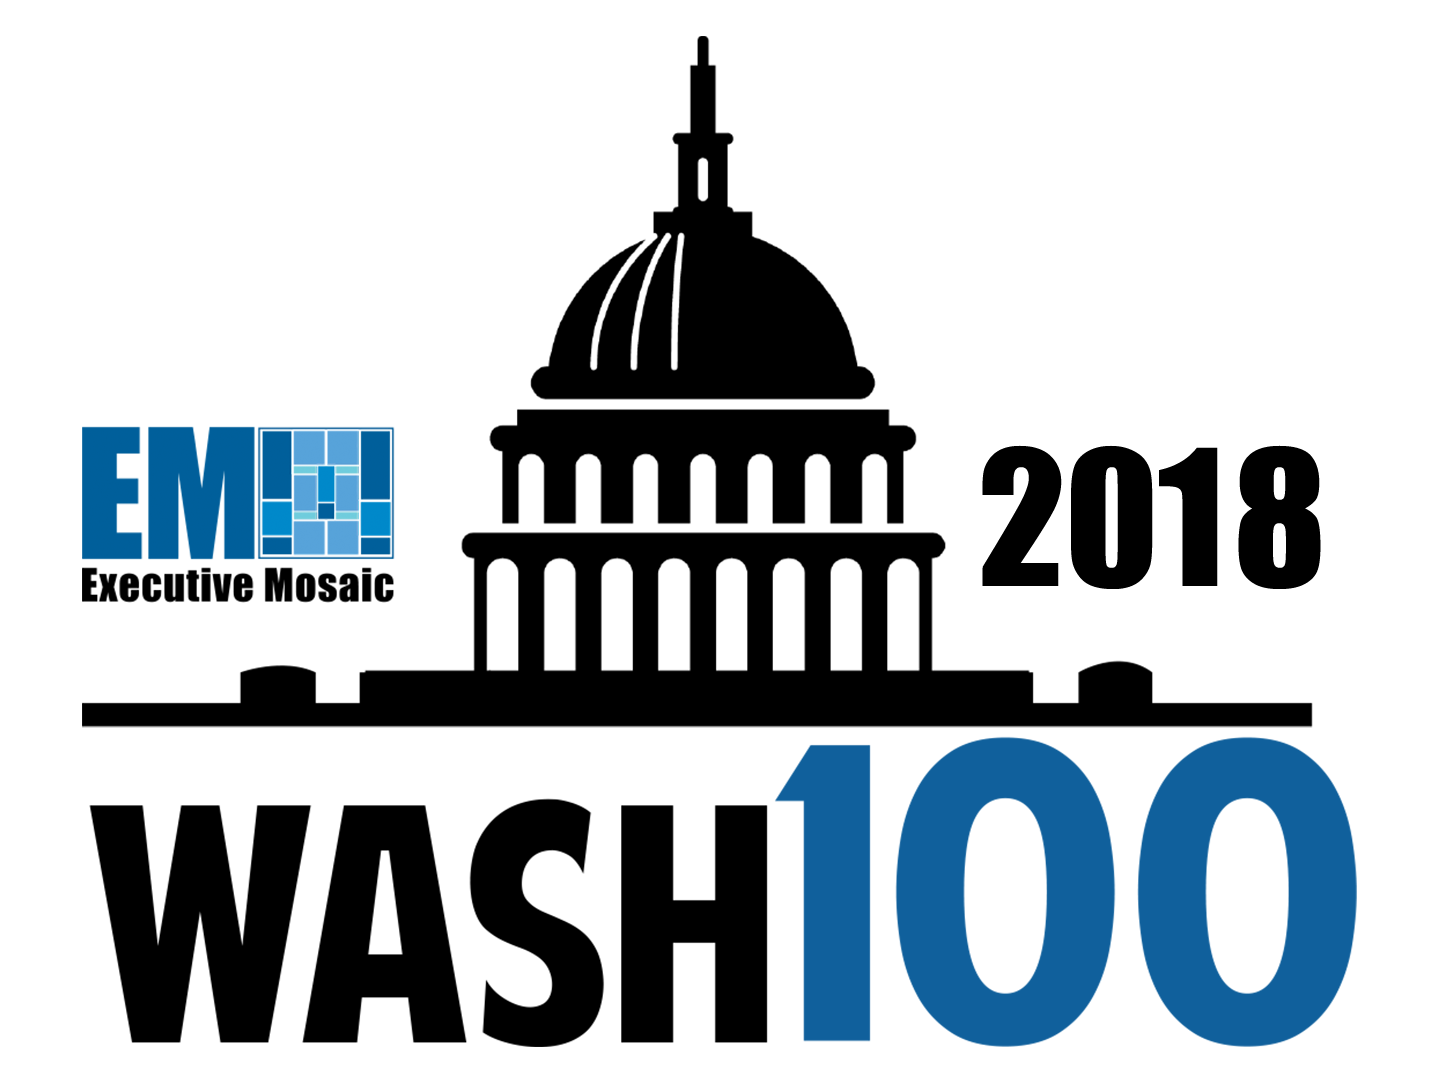 wash100-2018-logo.png